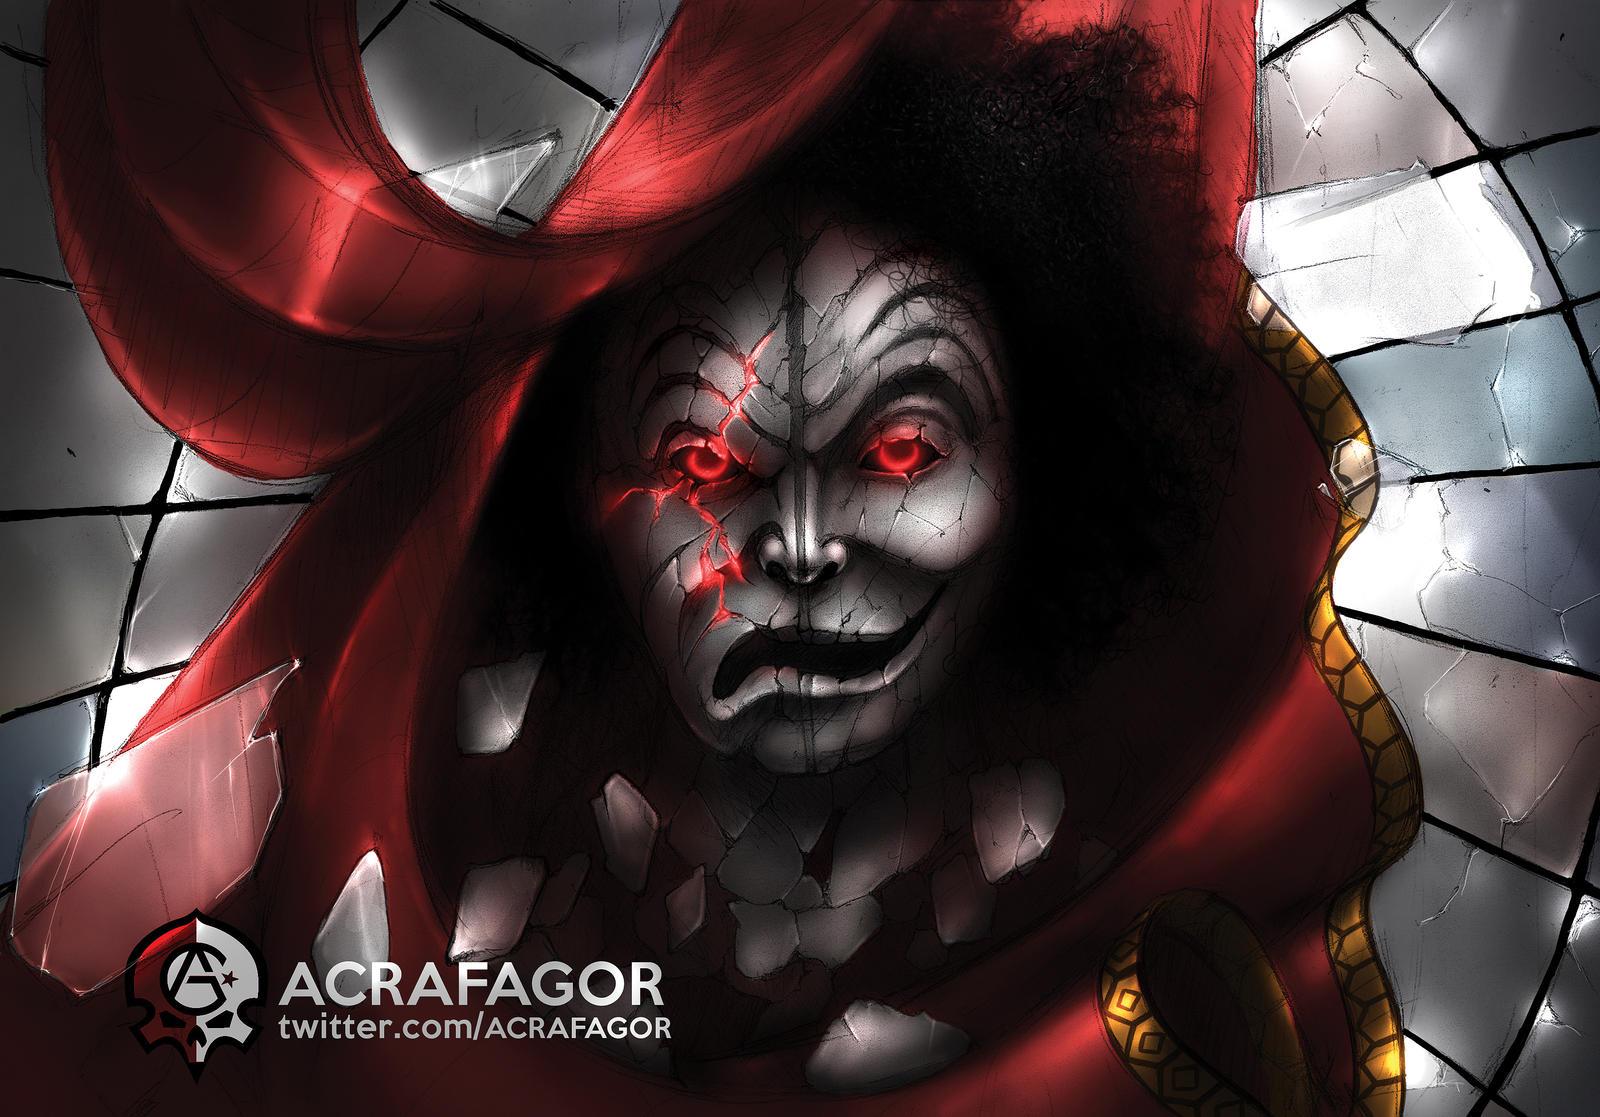 Da Kurlzz AT (American Tragedy) by acrafagor on DeviantArt